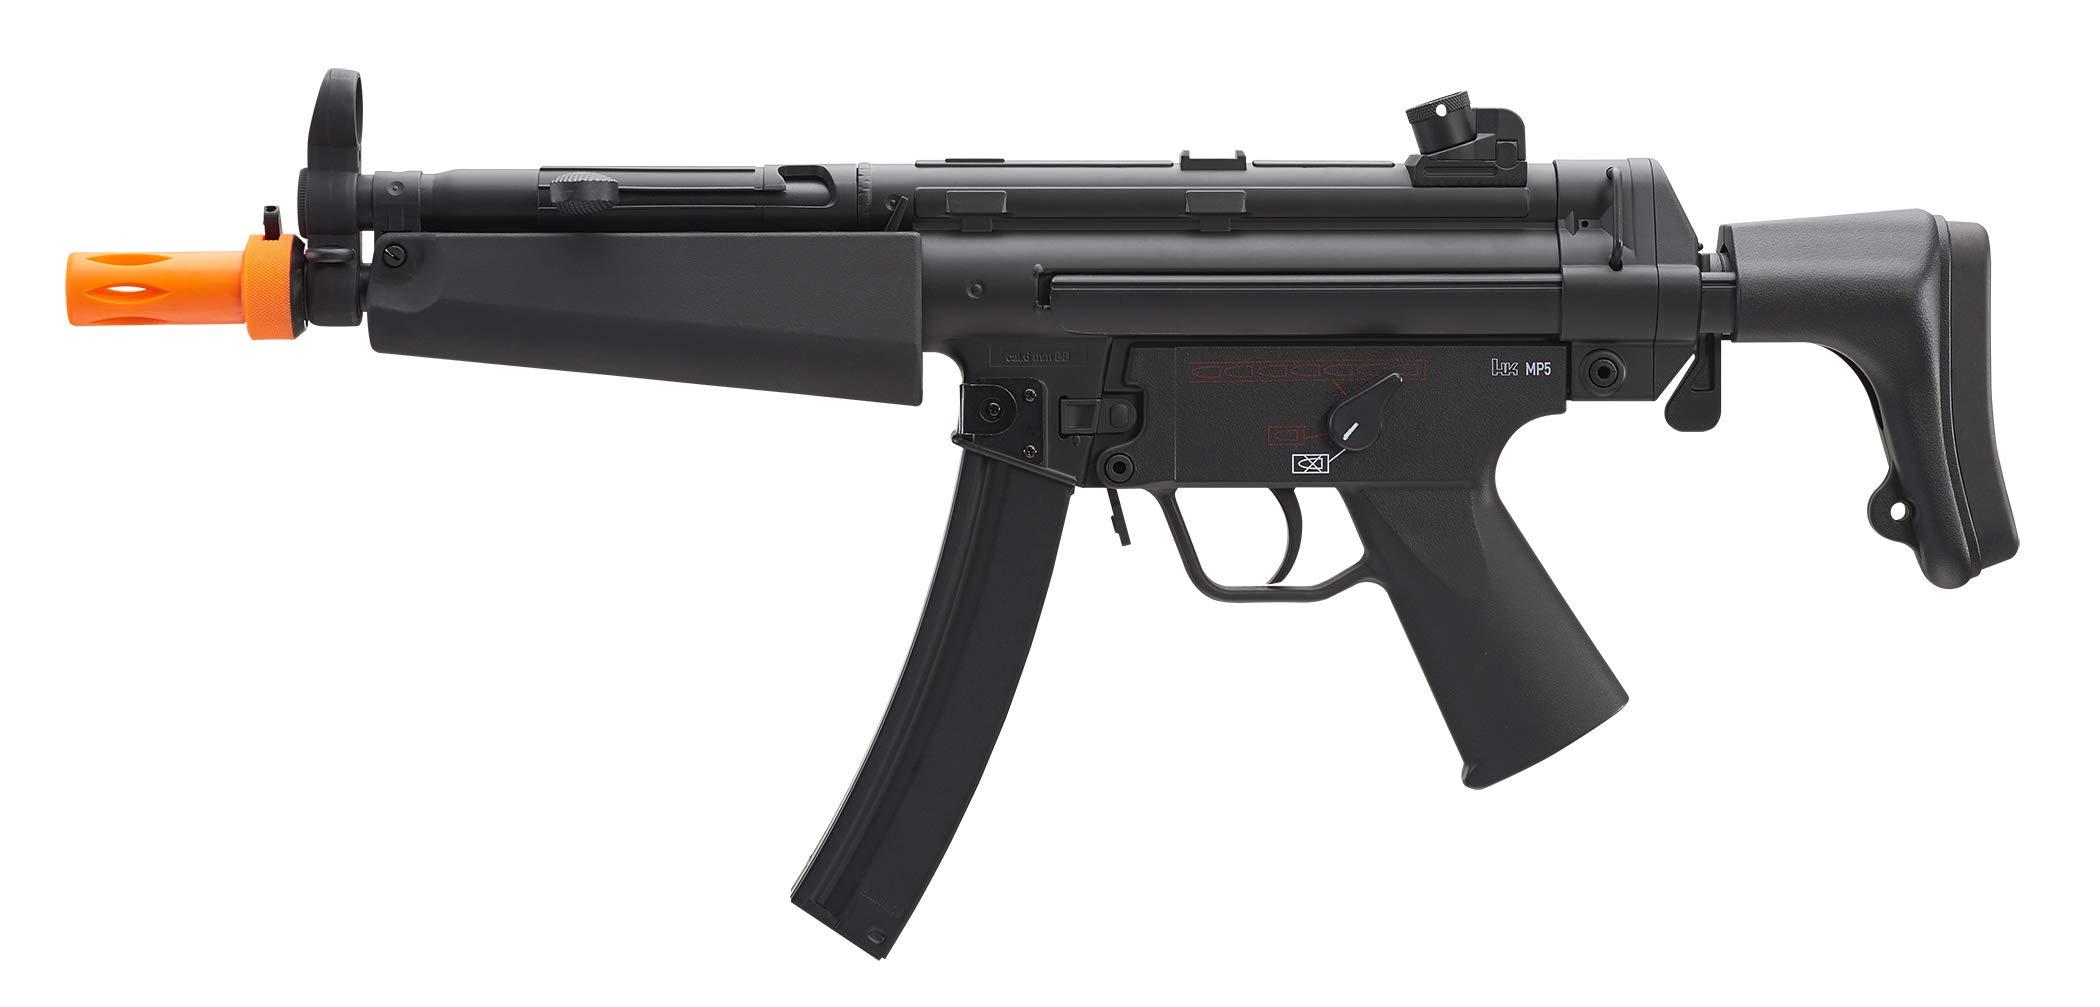 HK Heckler & Koch MP5 AEG Pistola Airsoft automática de rifle BB de 6 mm, kit de competencia MP5